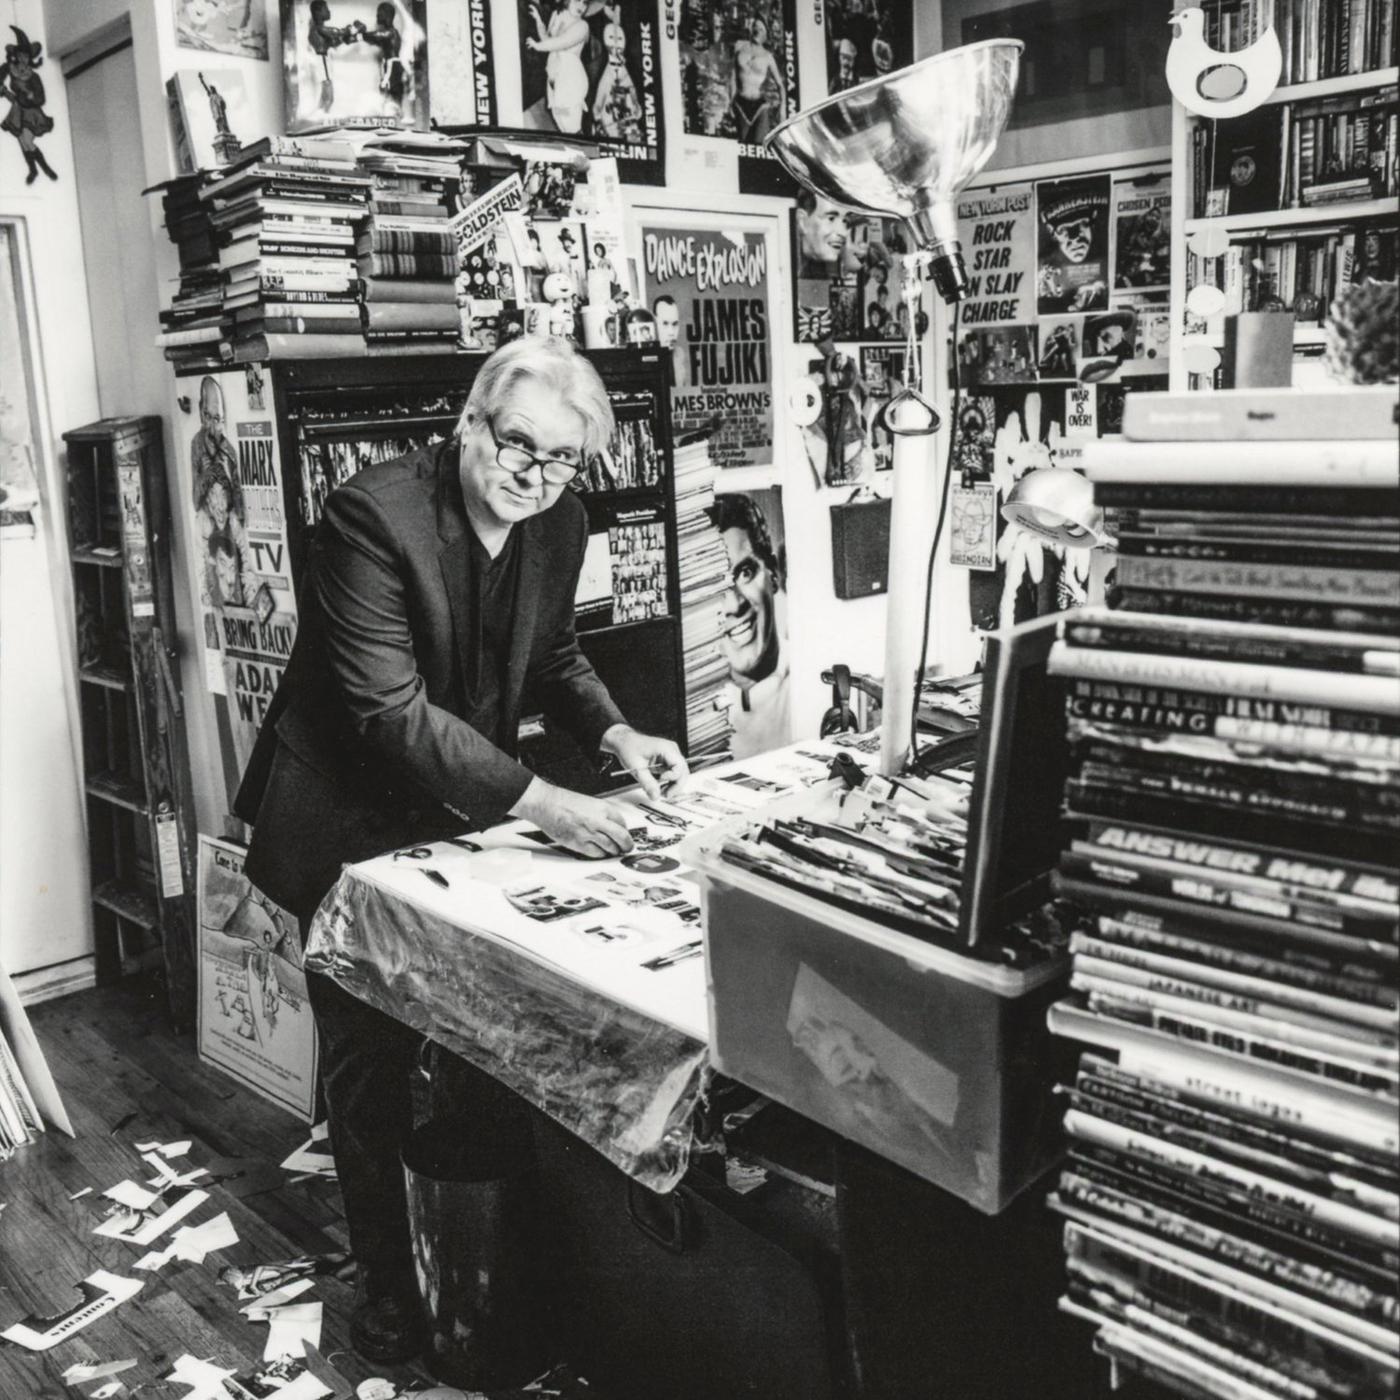 Stephen Kroninger - The Illustration Department Podcast